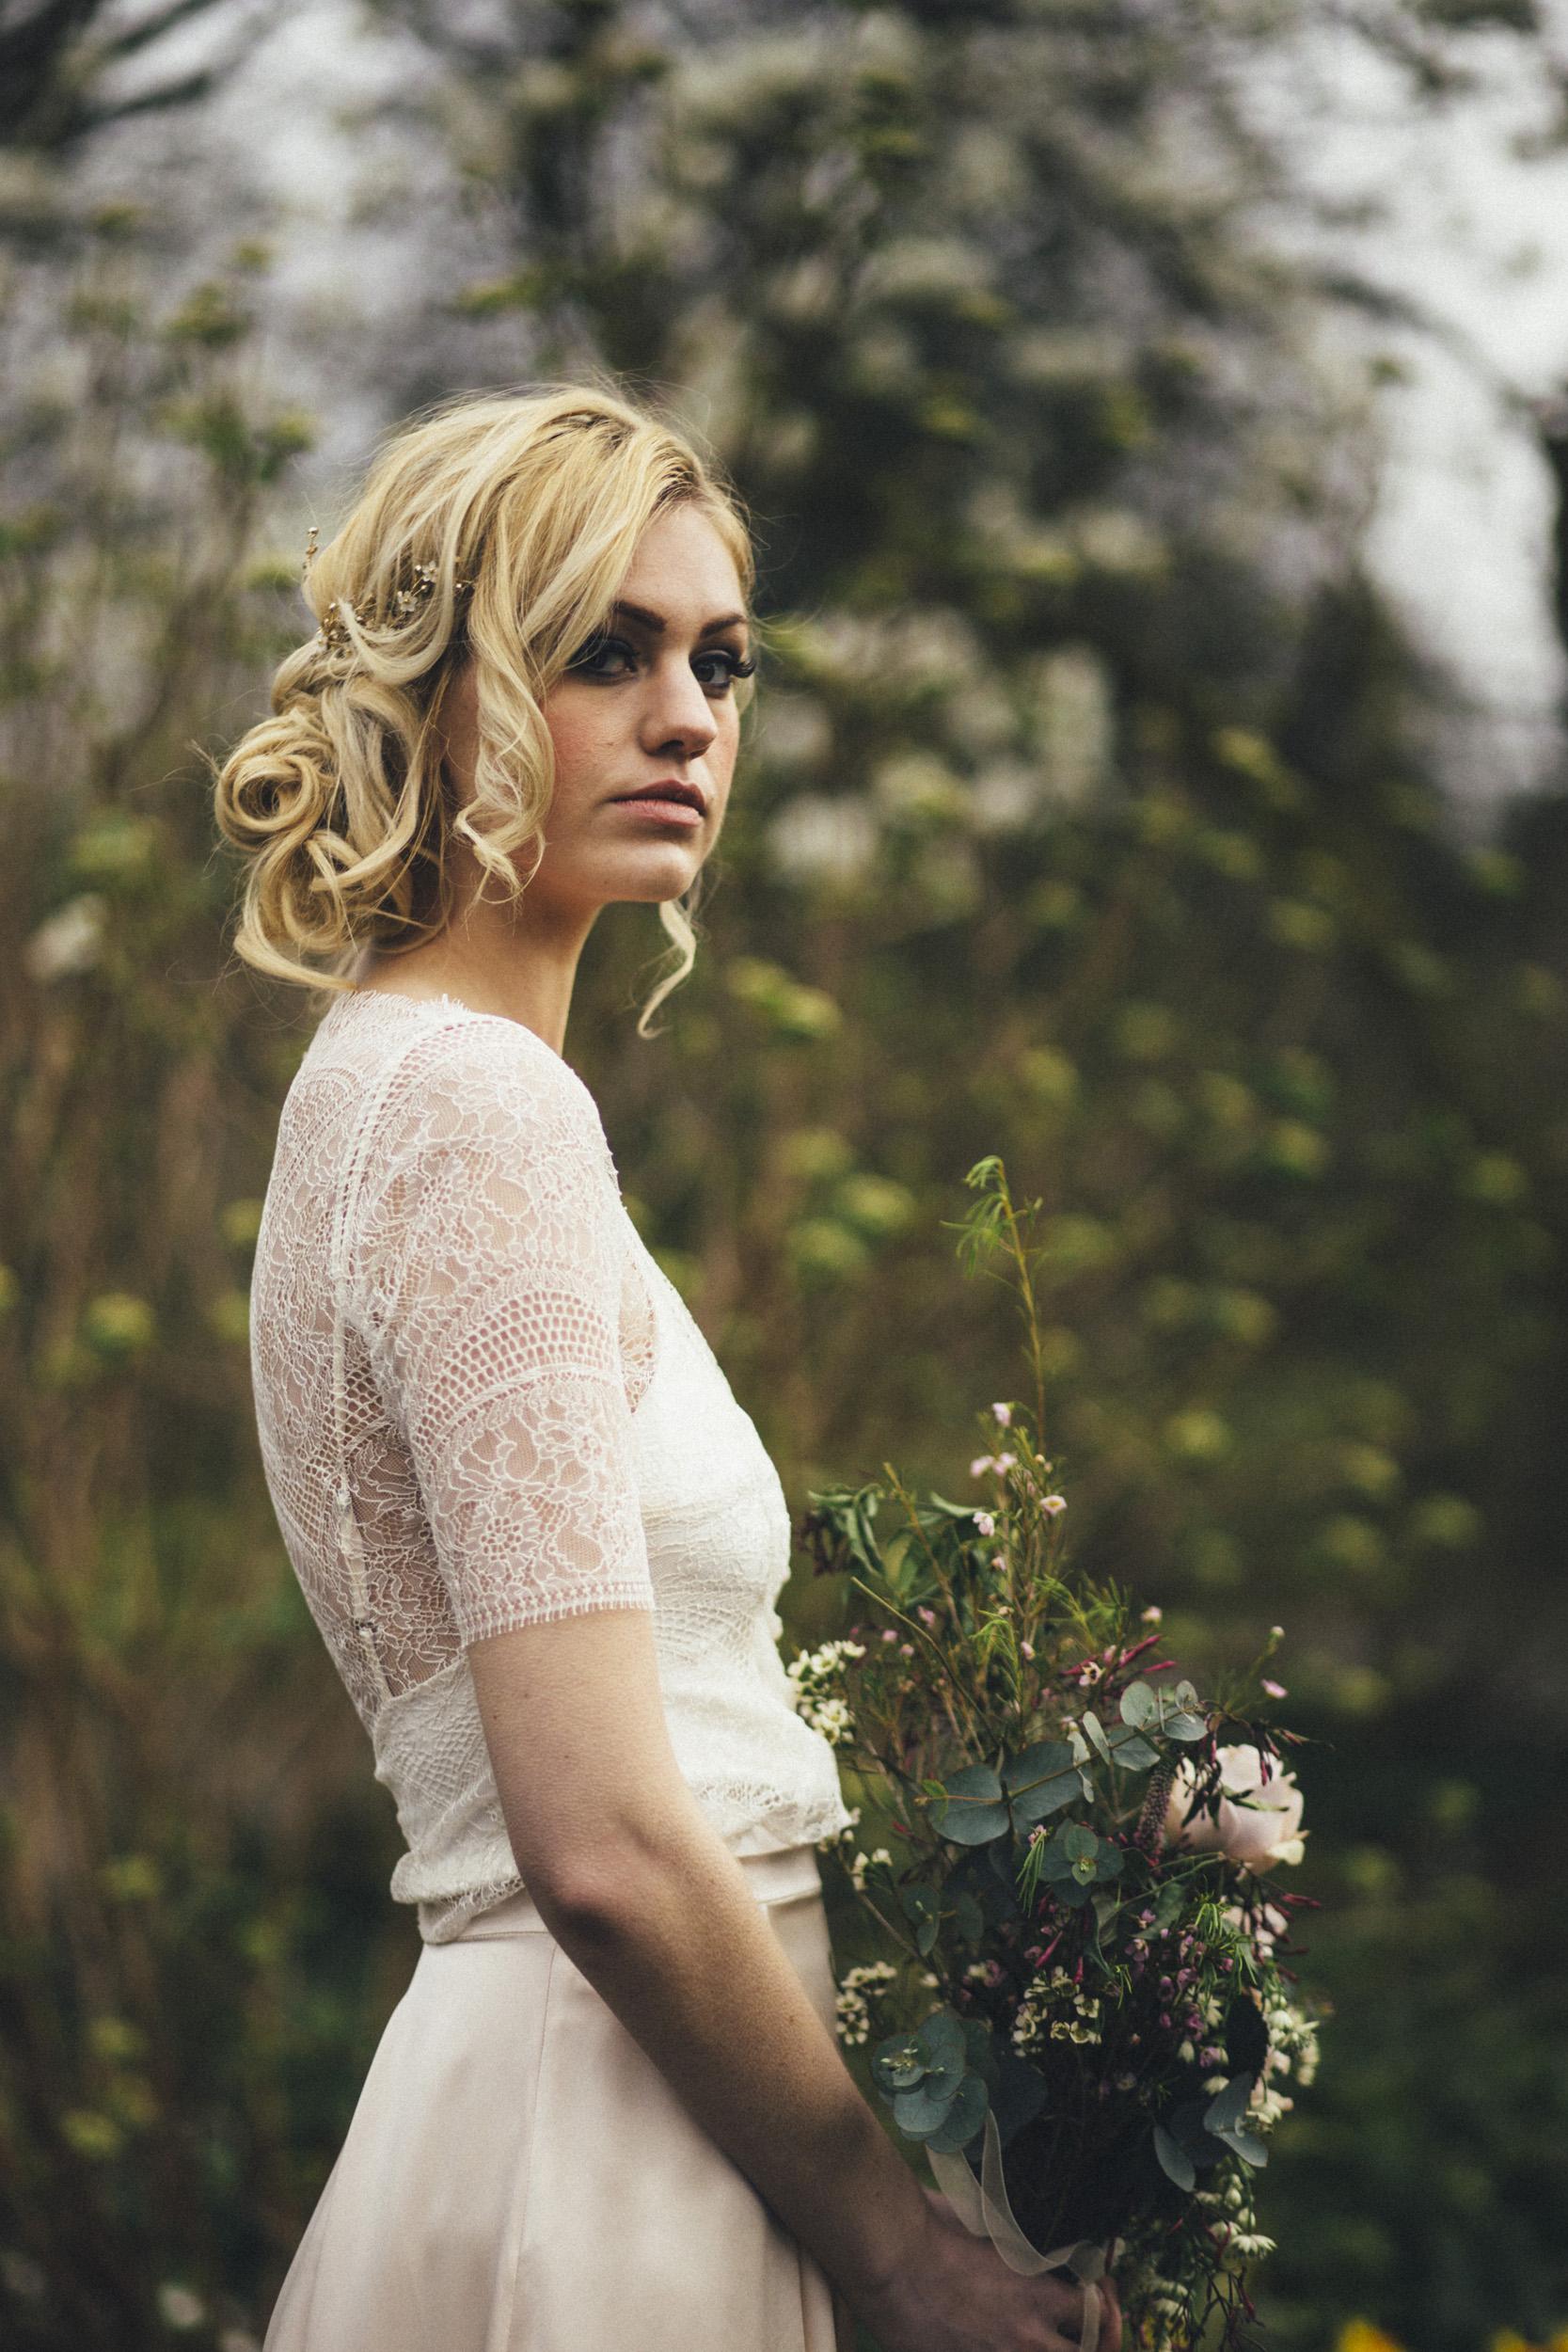 Spring-Bridal-Kate-Beaumont-Shelley-Richmond-Vintage-Wedding-Dress-9.jpg